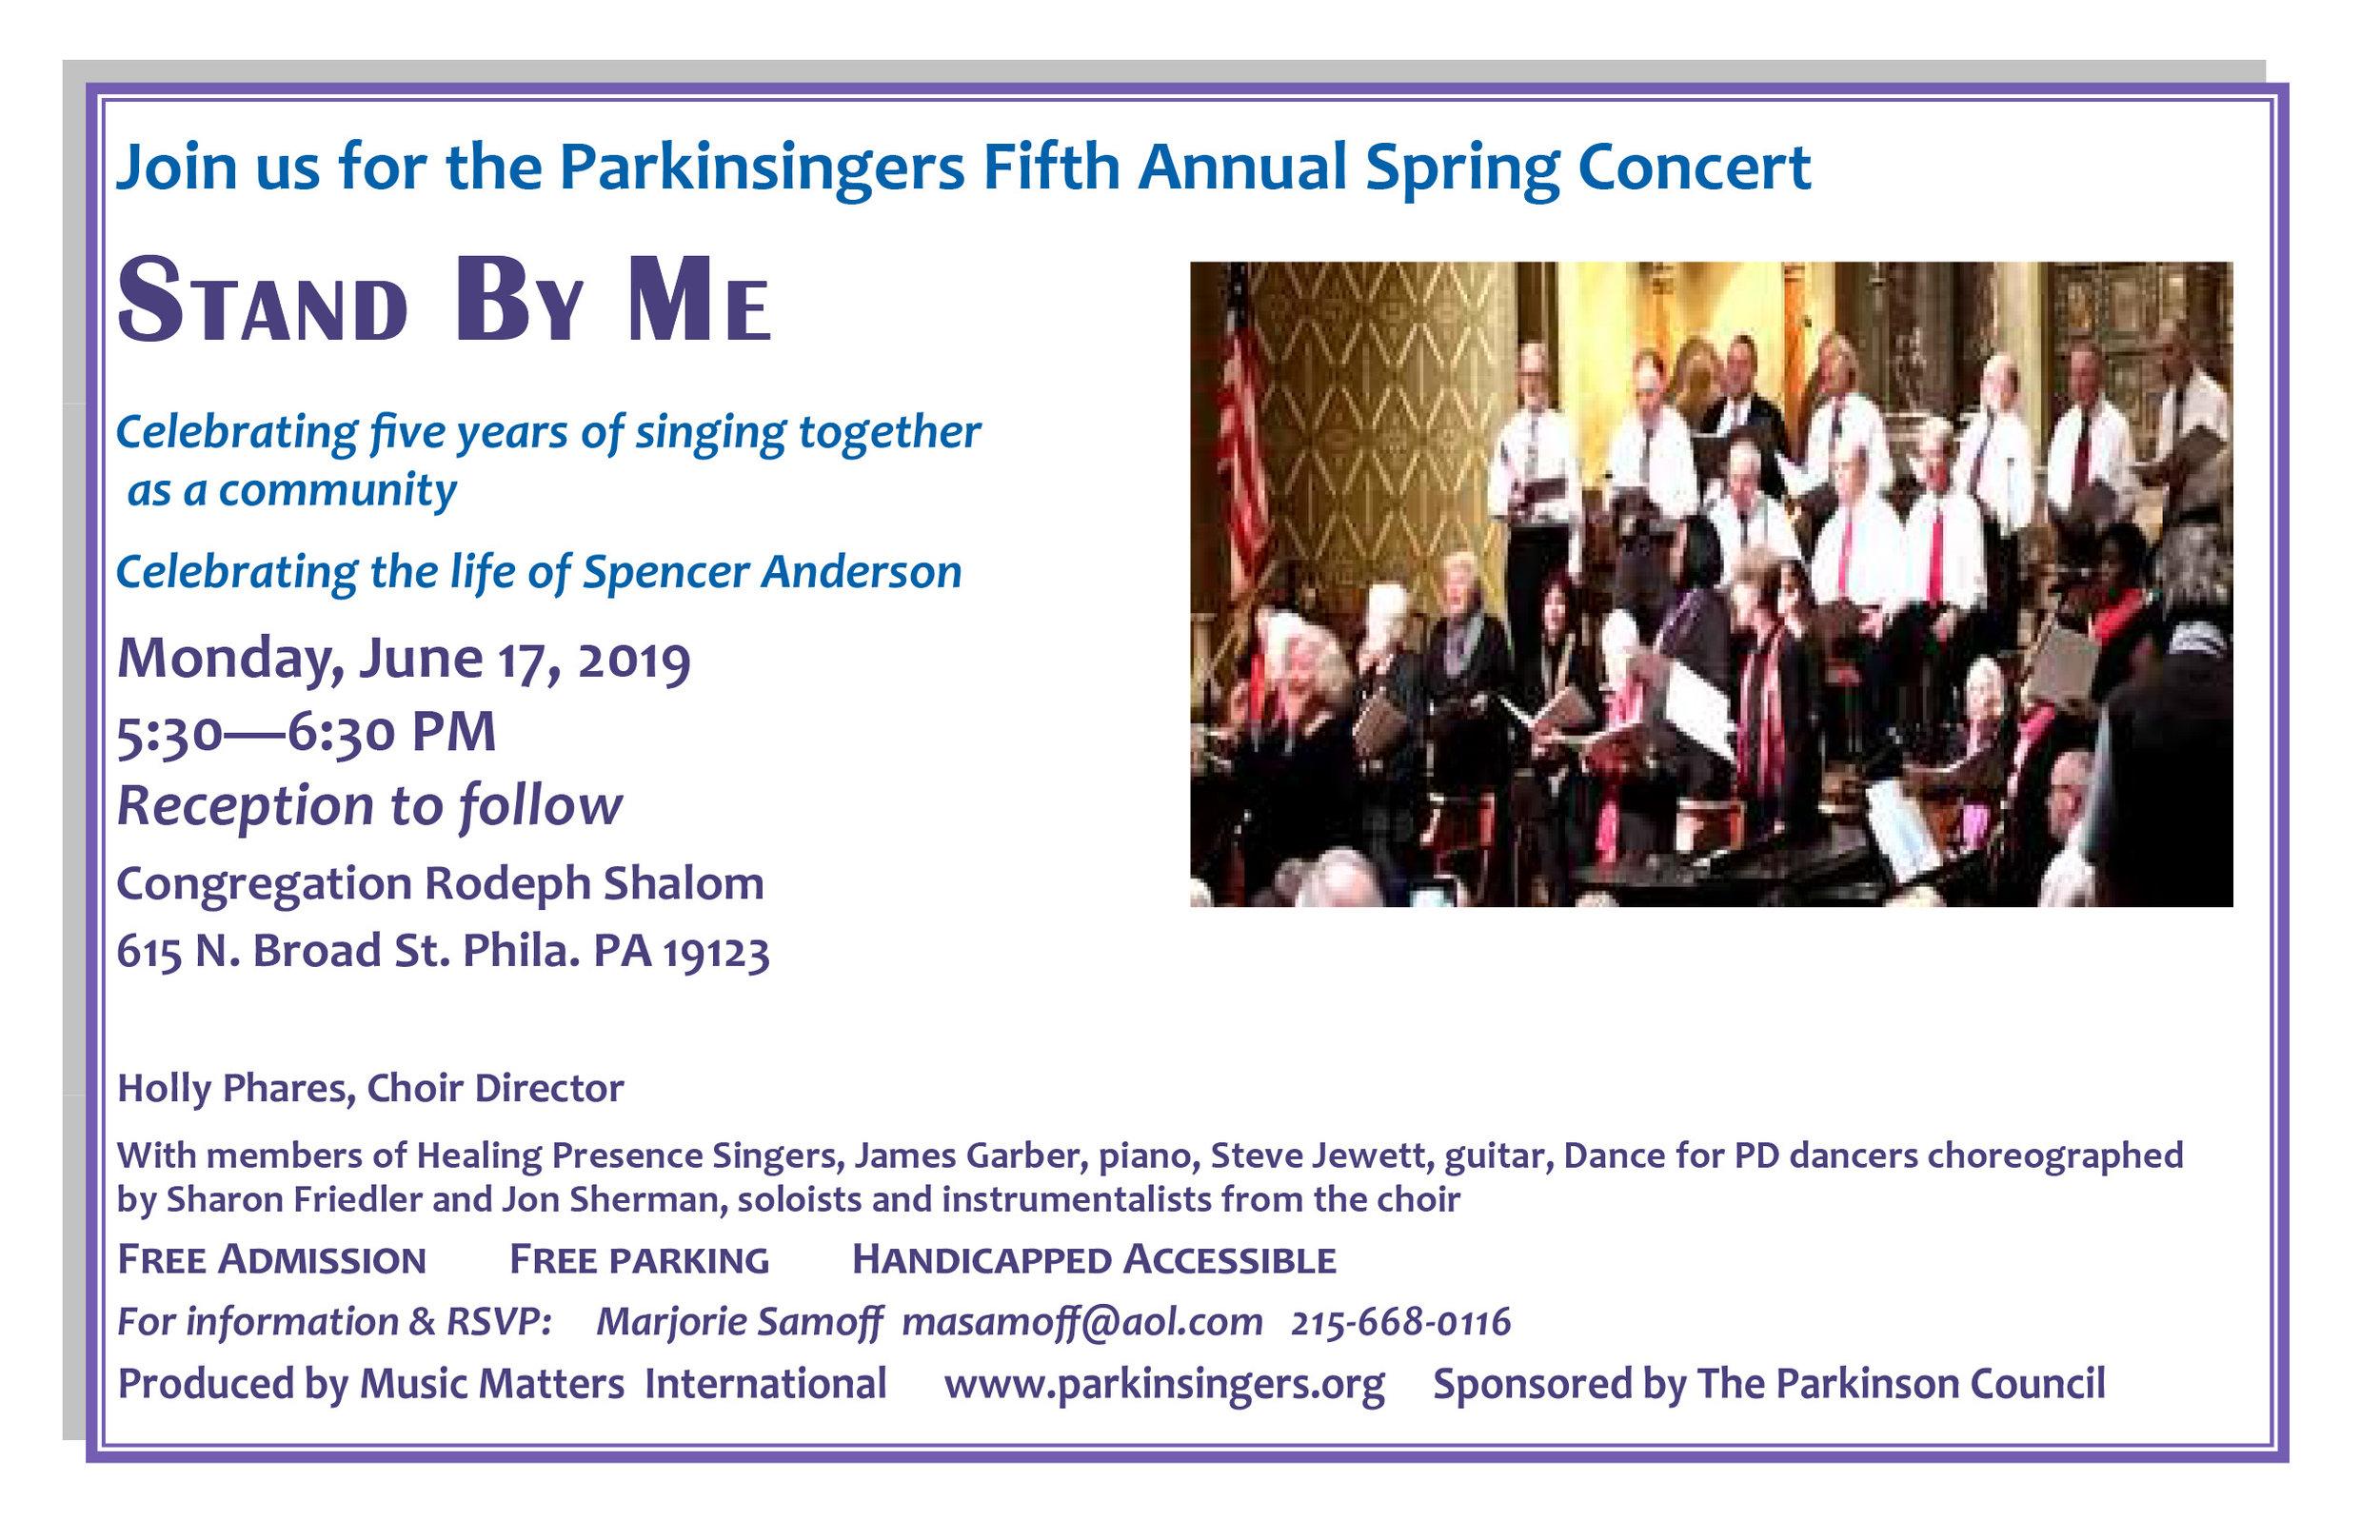 Parkinsingers 2019 June 17 spring  concert invitation final.jpg